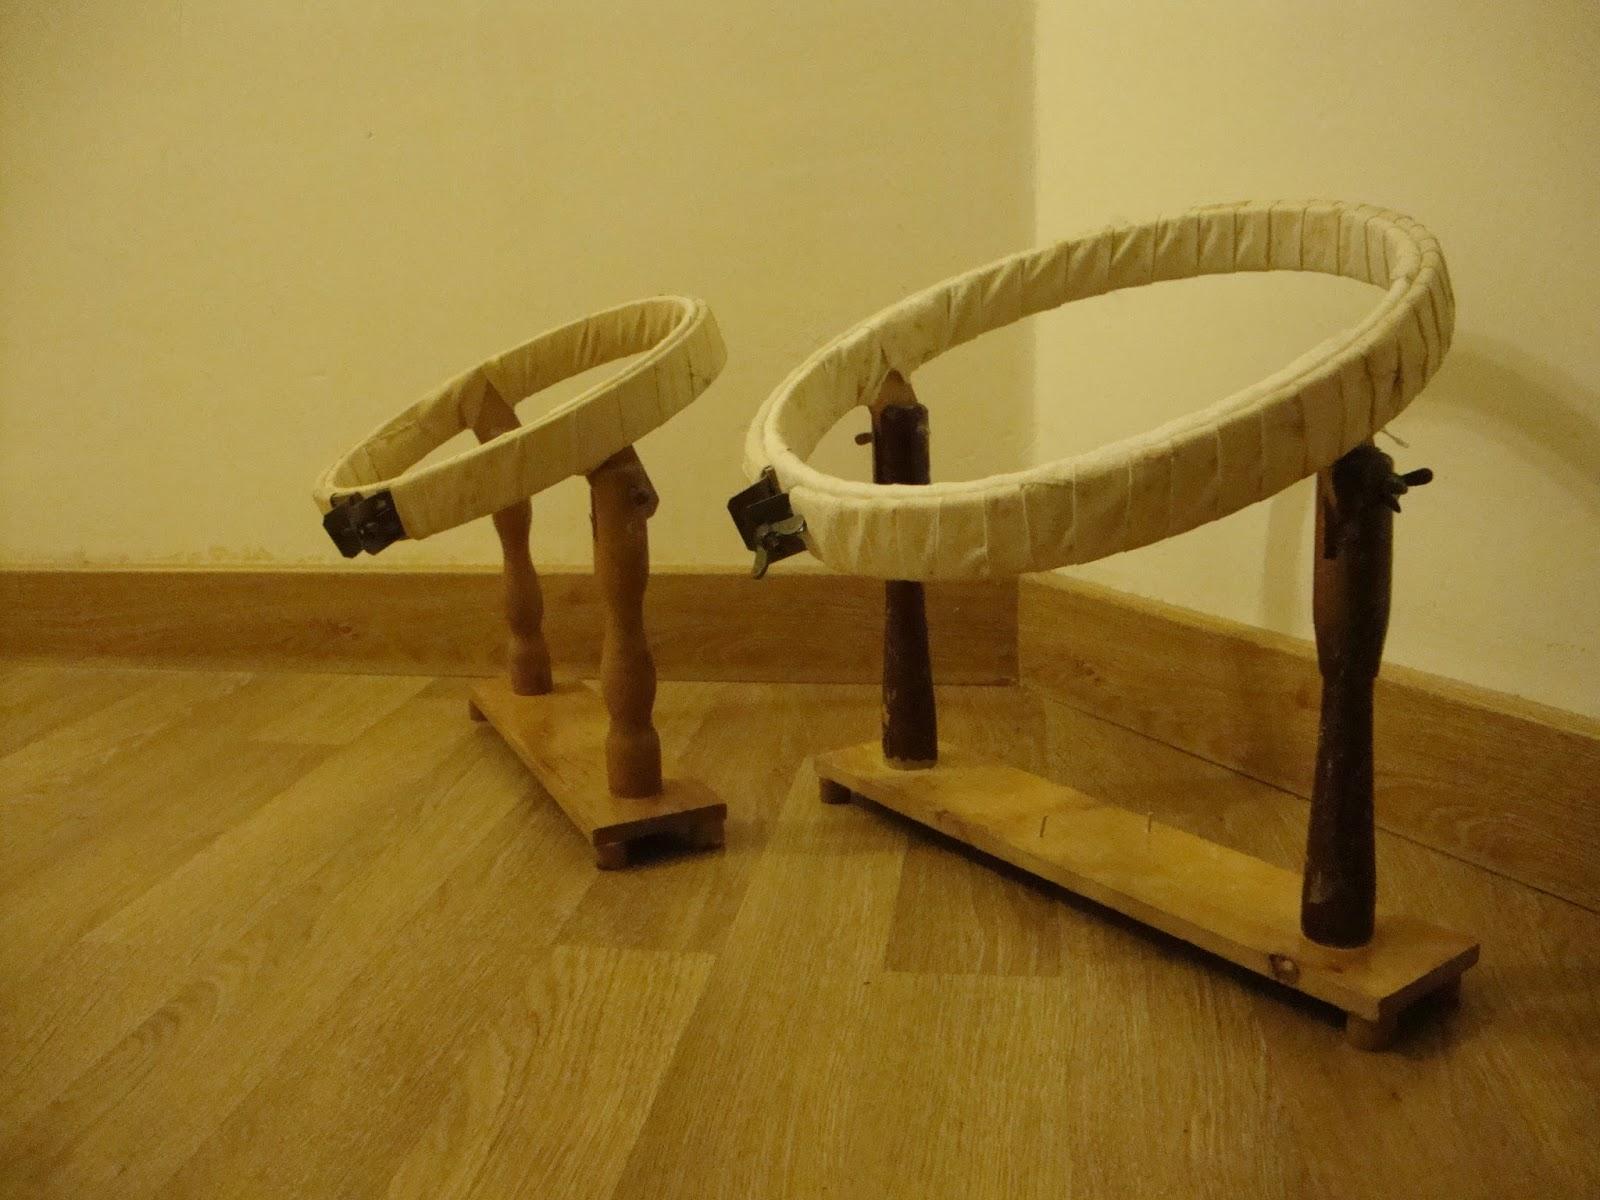 Reutilizar un bastidor de bordar como macetero handbox - Bastidores para bordar ...